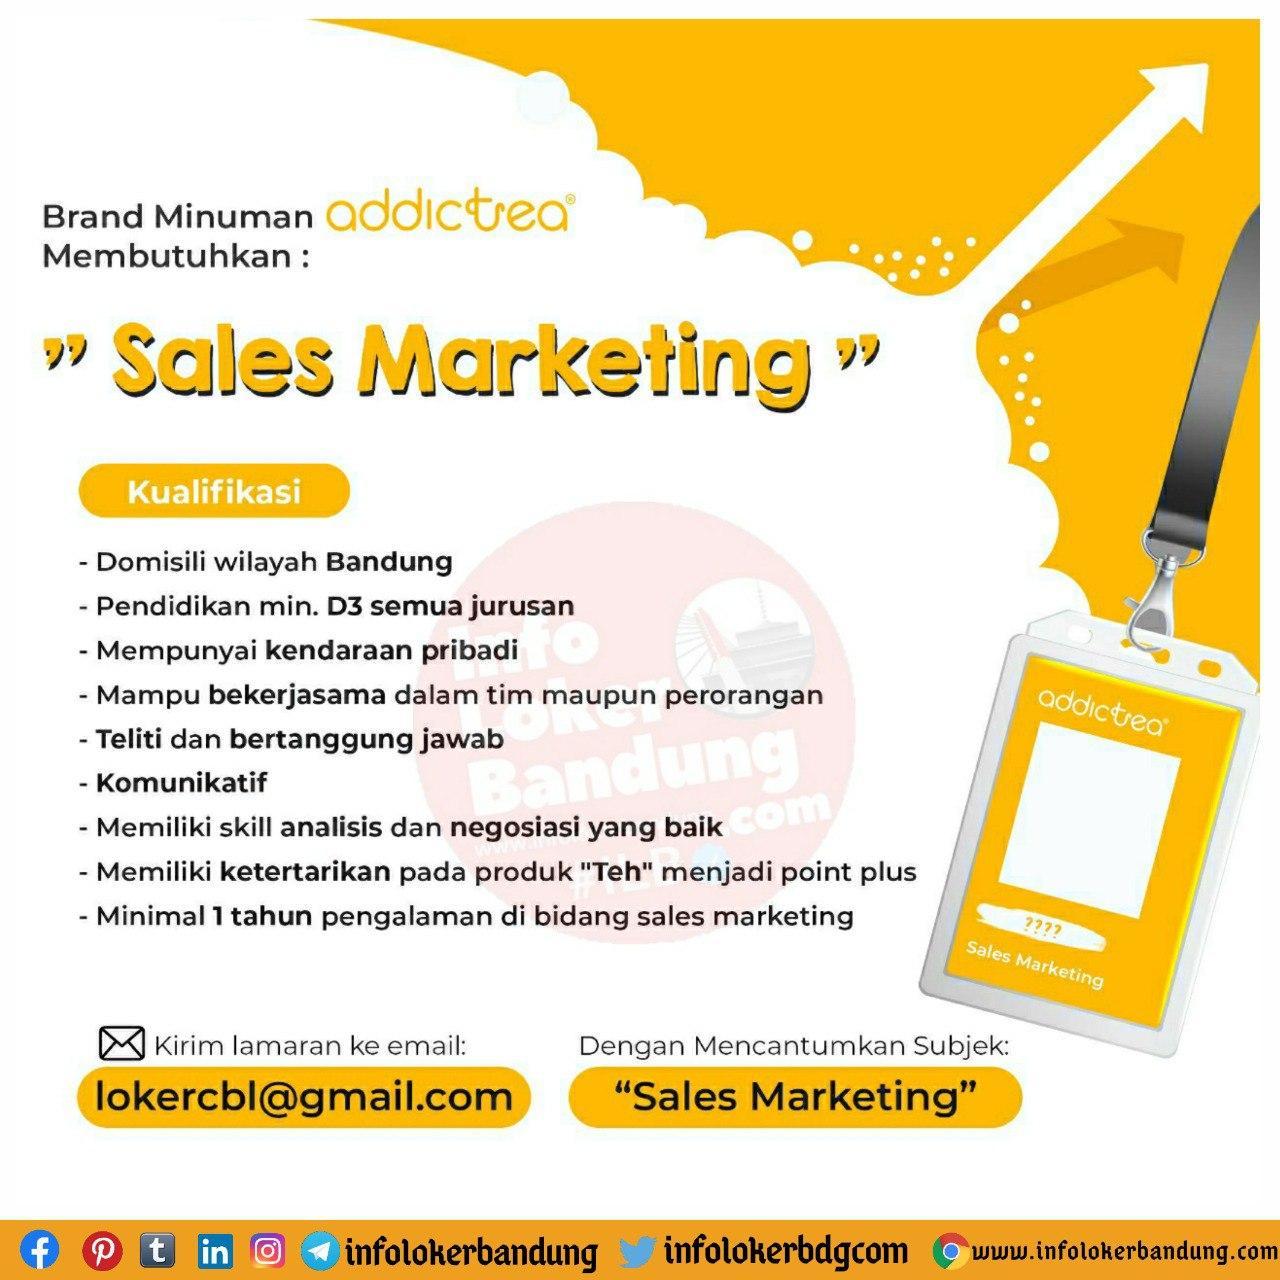 Lowongan Kerja Sales Marketing Addictea Bandung September 2020